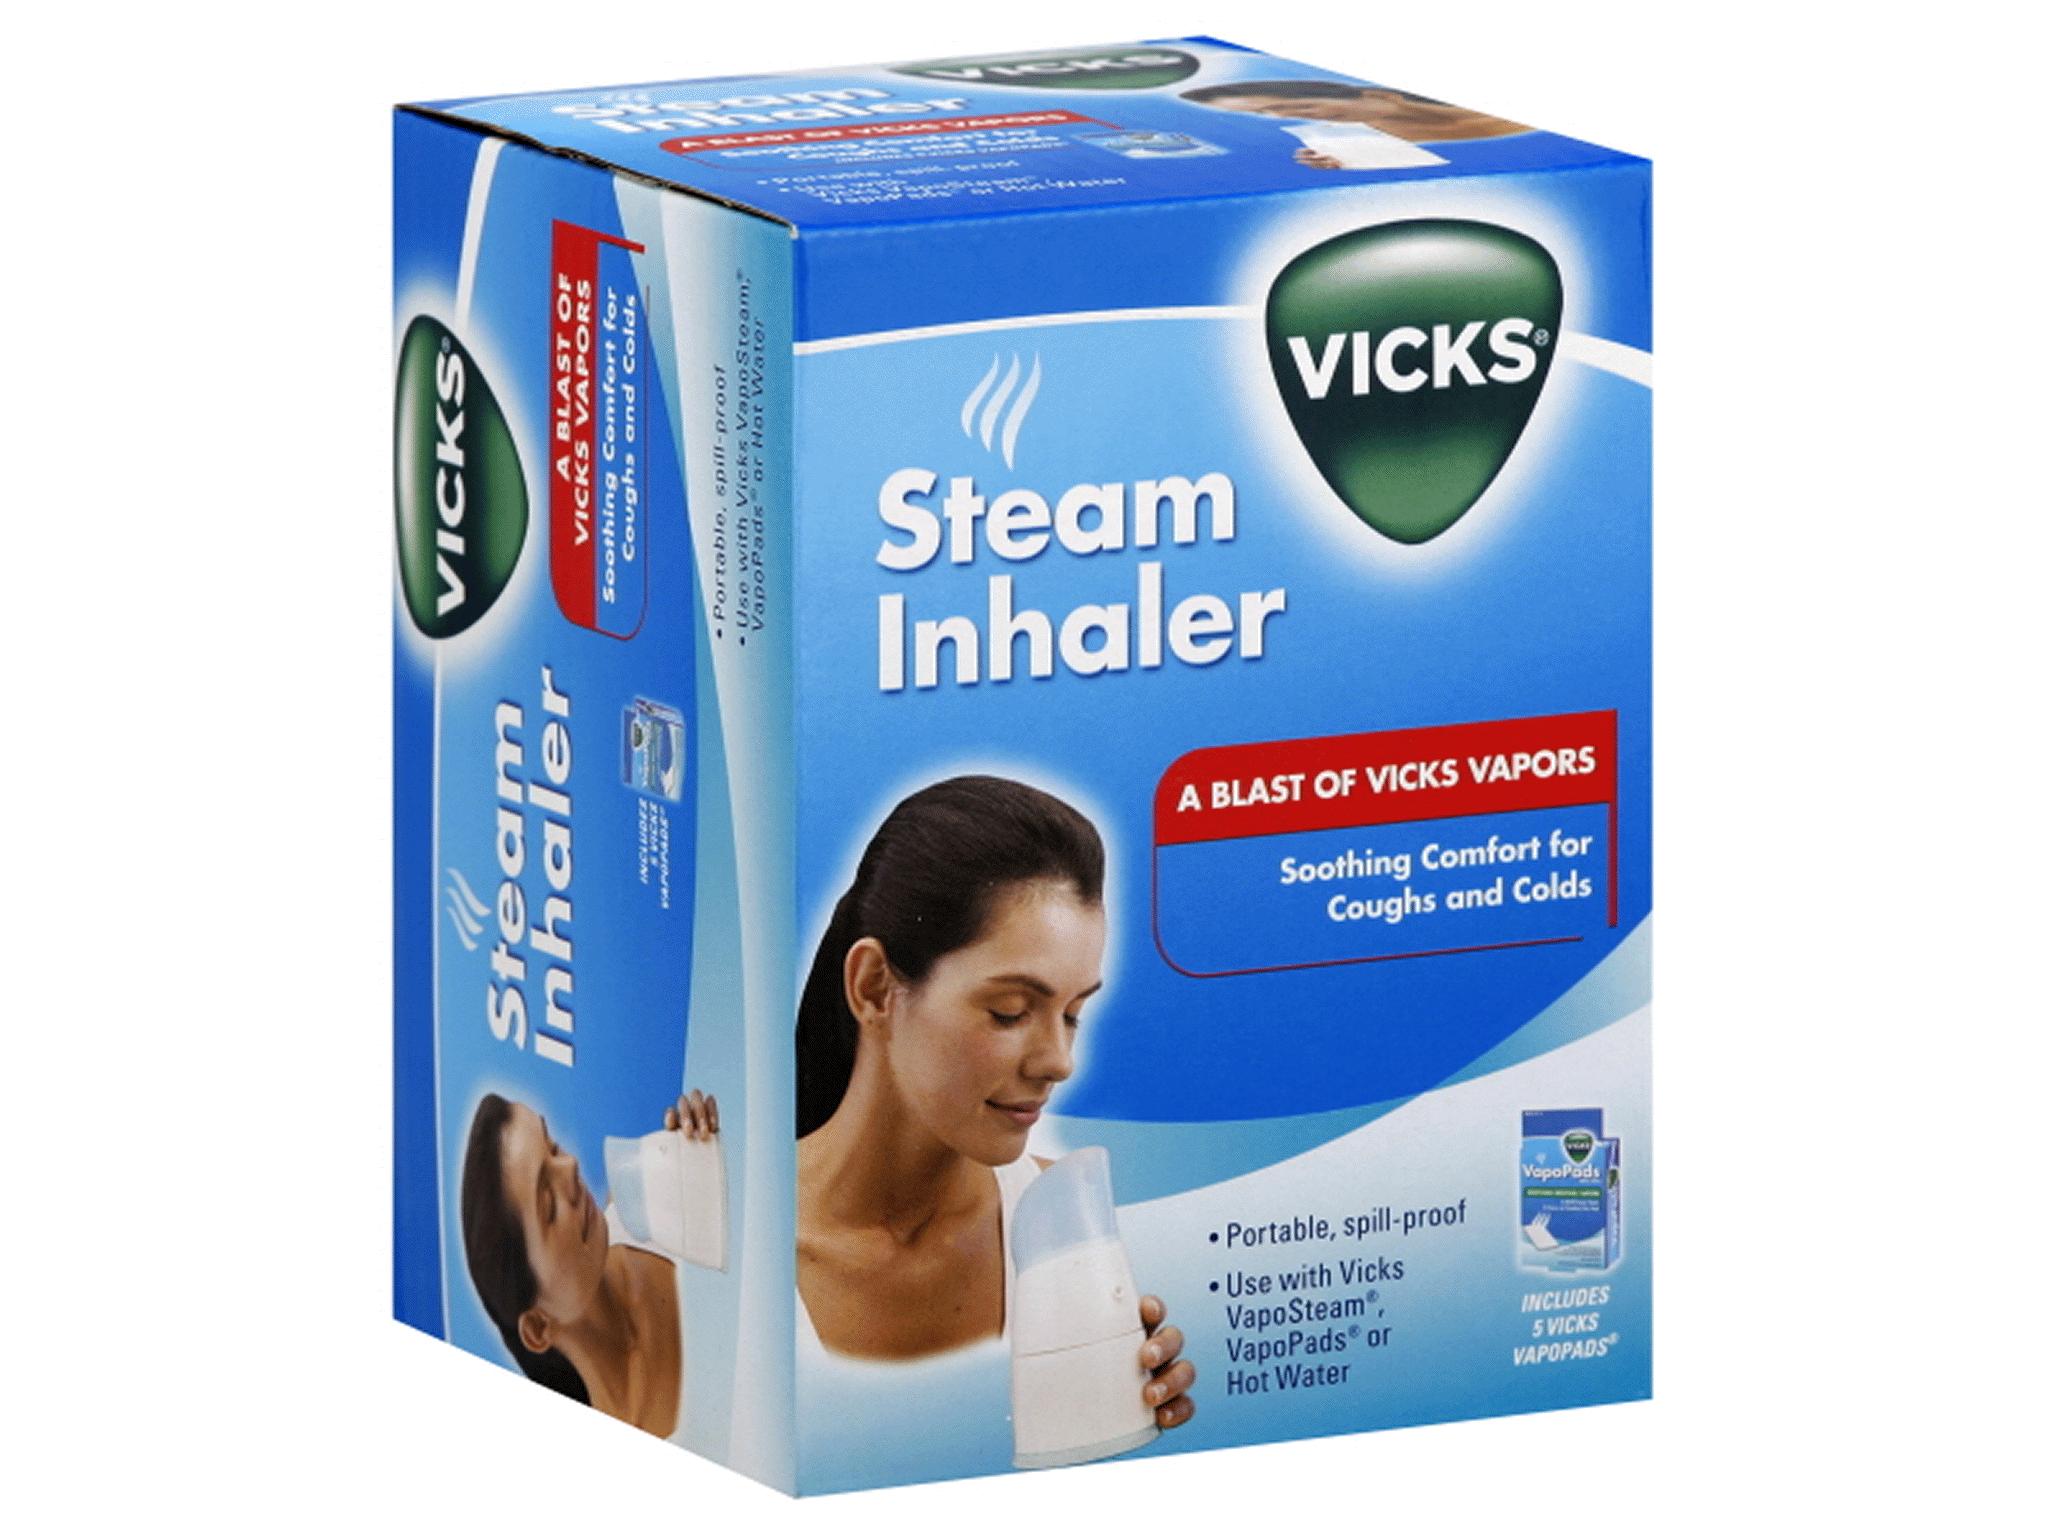 Steam Inhaler for home use